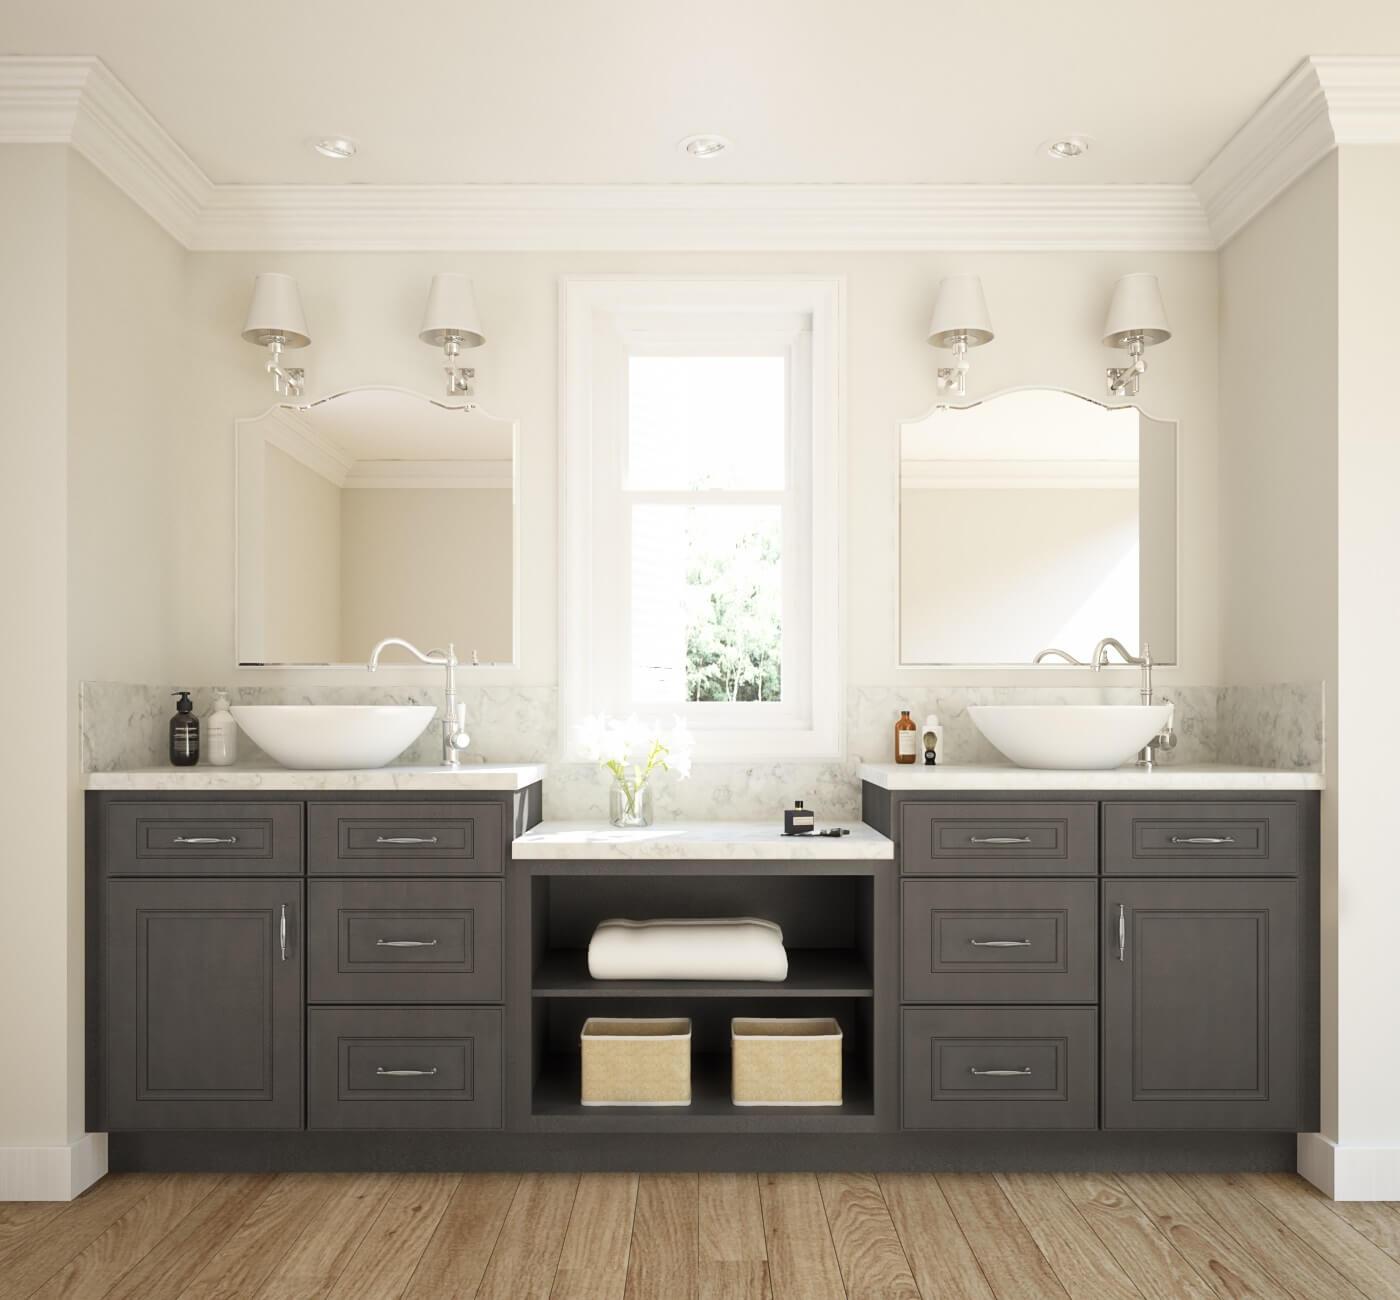 Glazed Stone Grey Ready To Assemble Bathroom Vanities